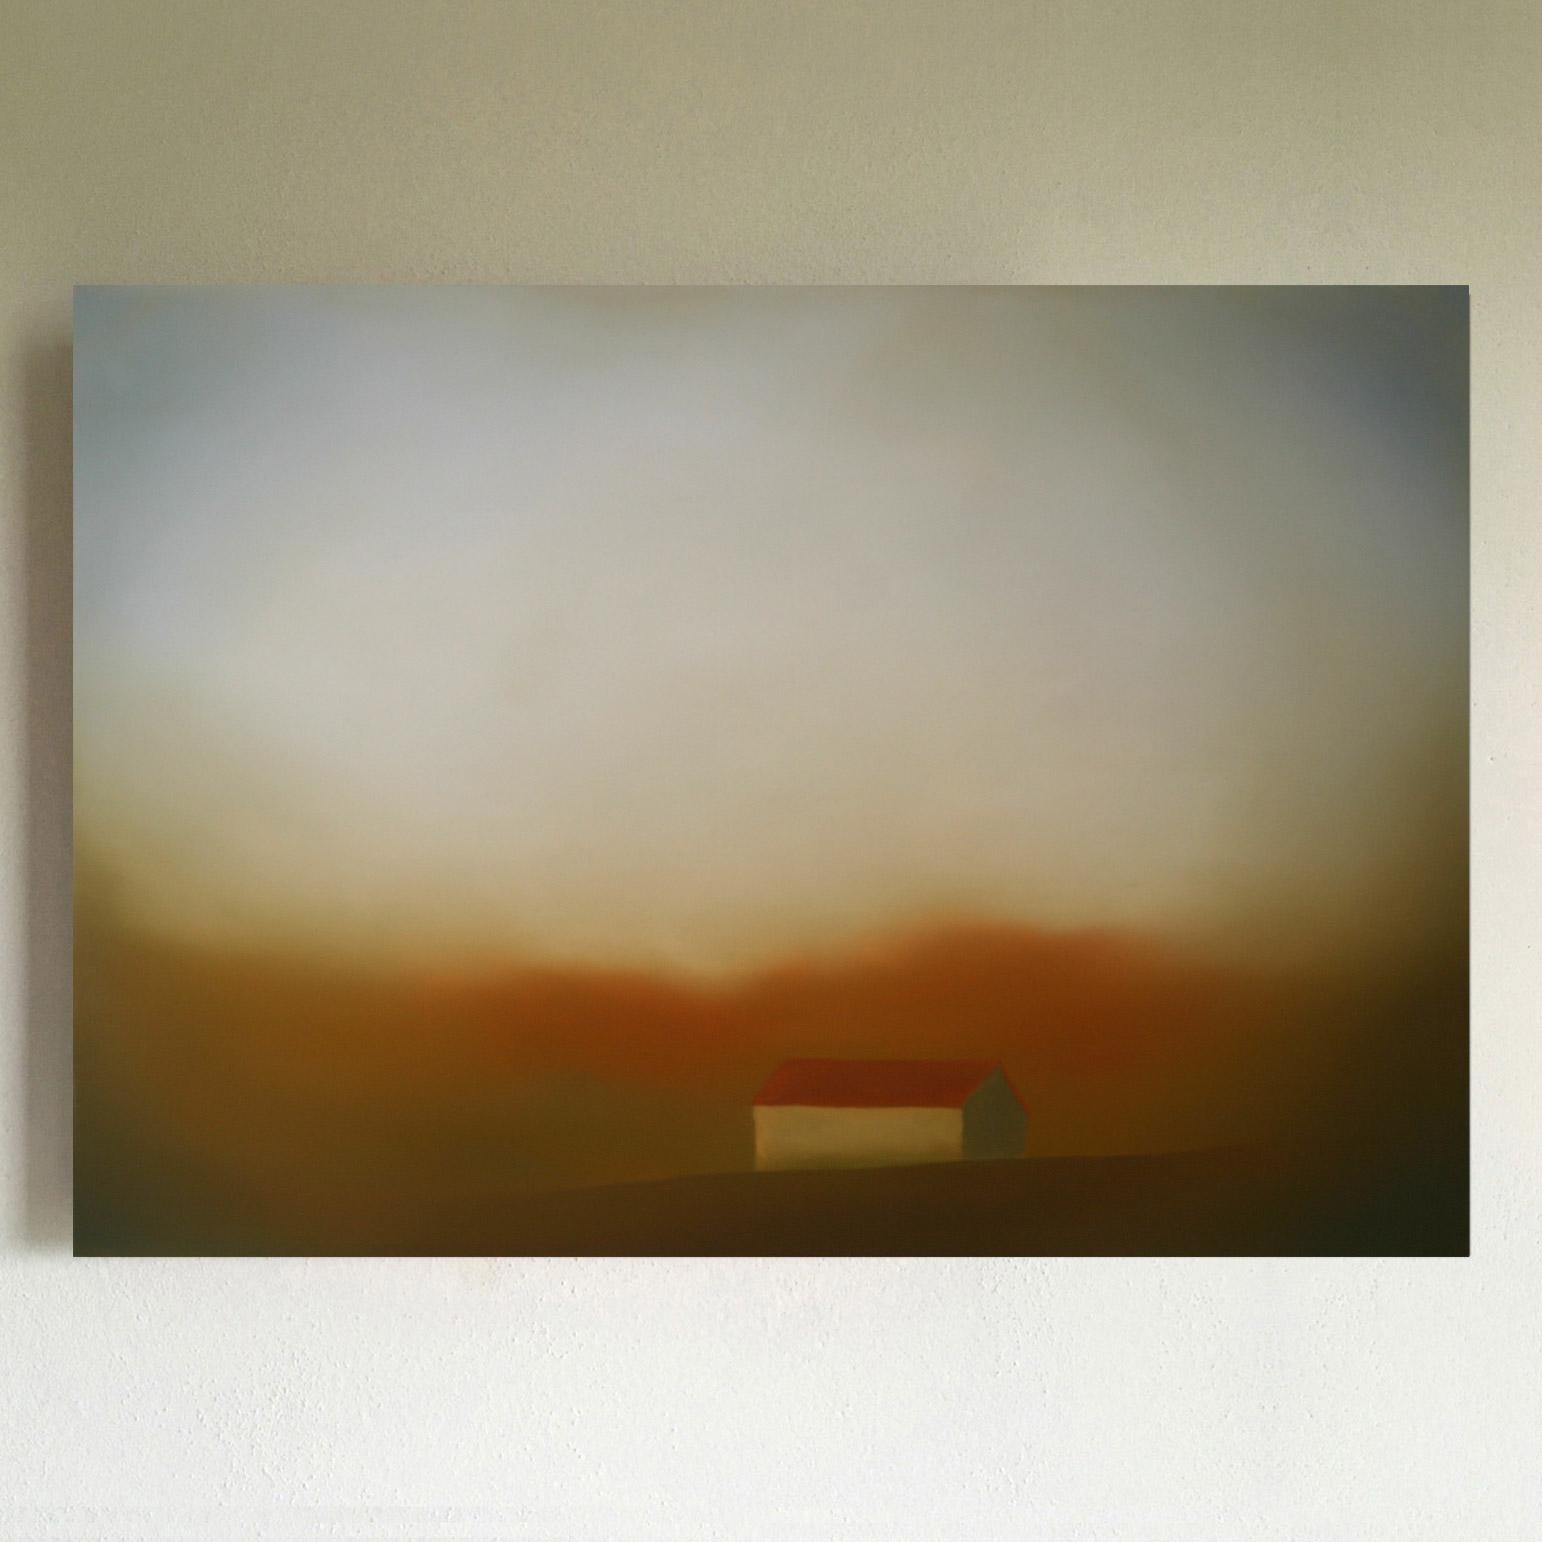 T#62-2010, oil on canvas, 70x100cm, priv. coll.